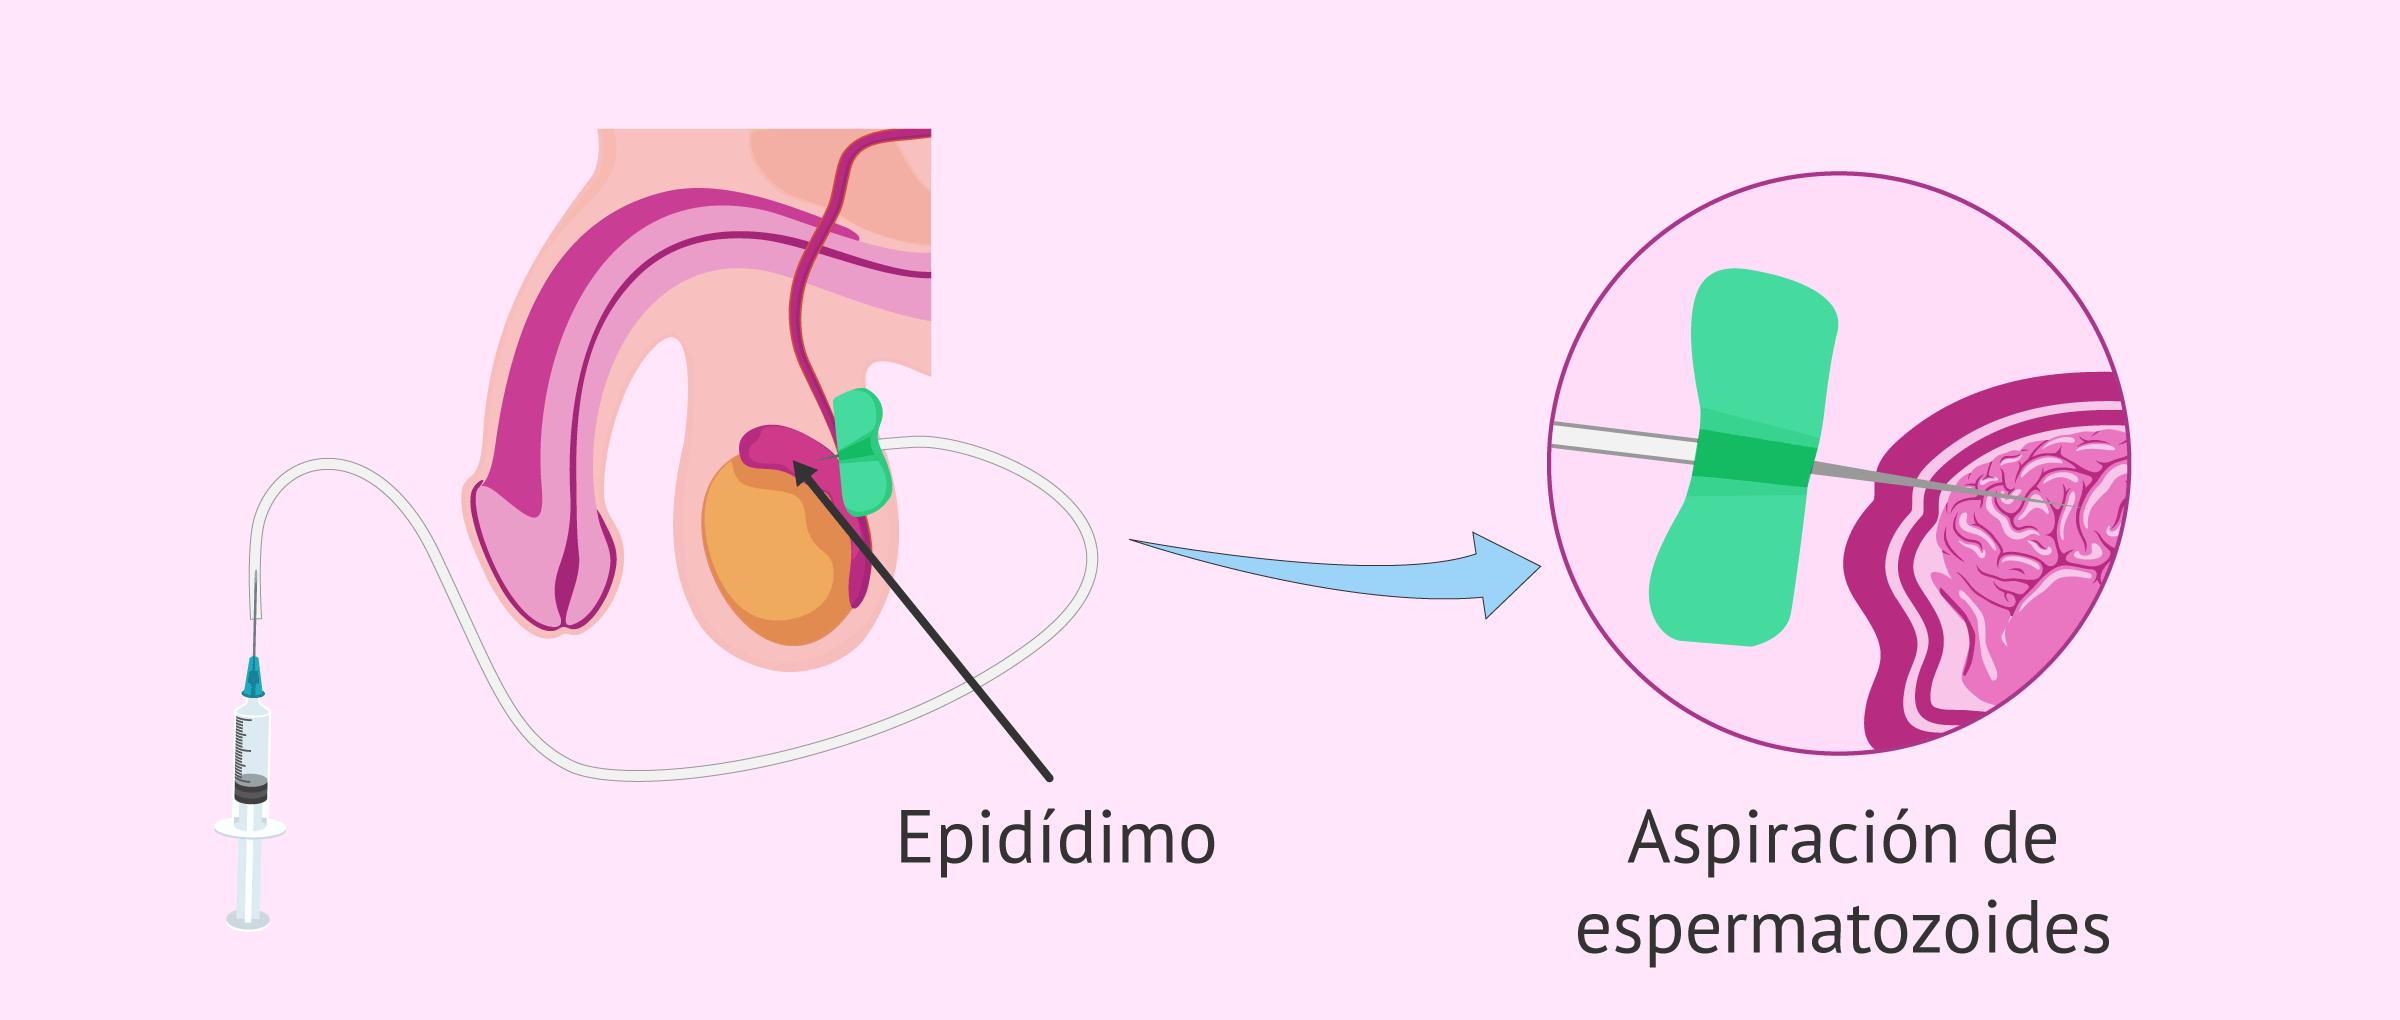 Aspiración de espermatozoides del epidídimo por PESA